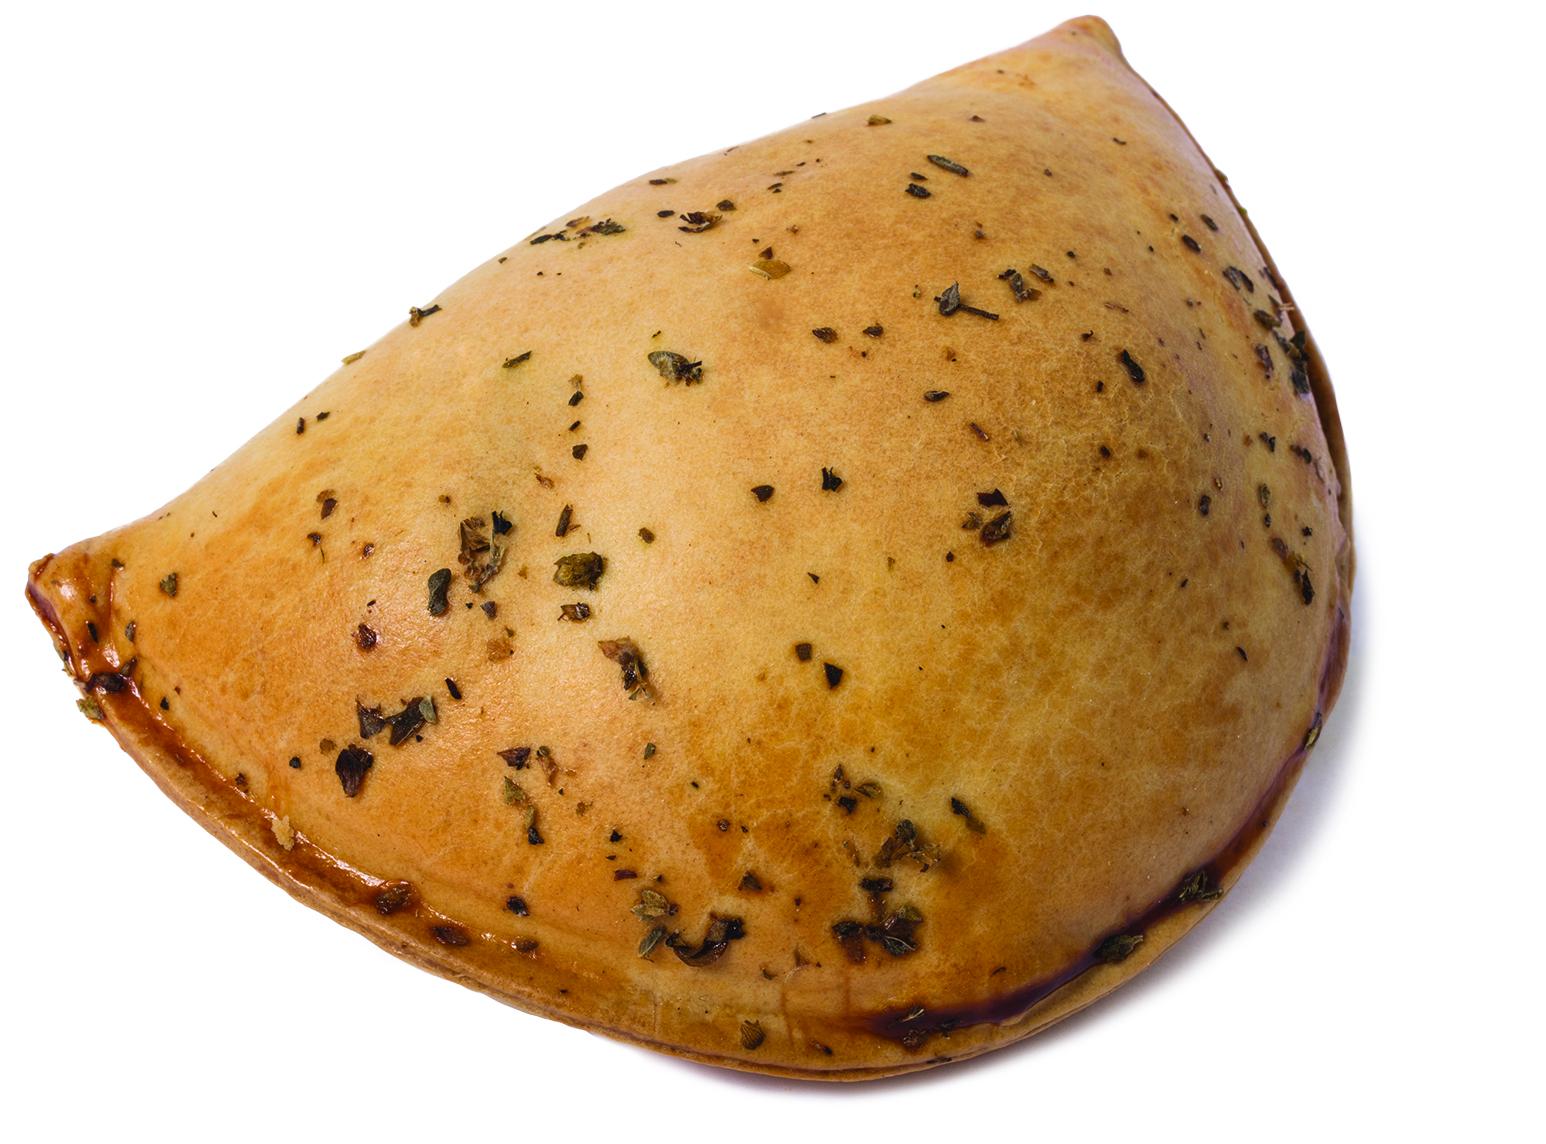 Lanche - Assados Pastel de Nata com Carne